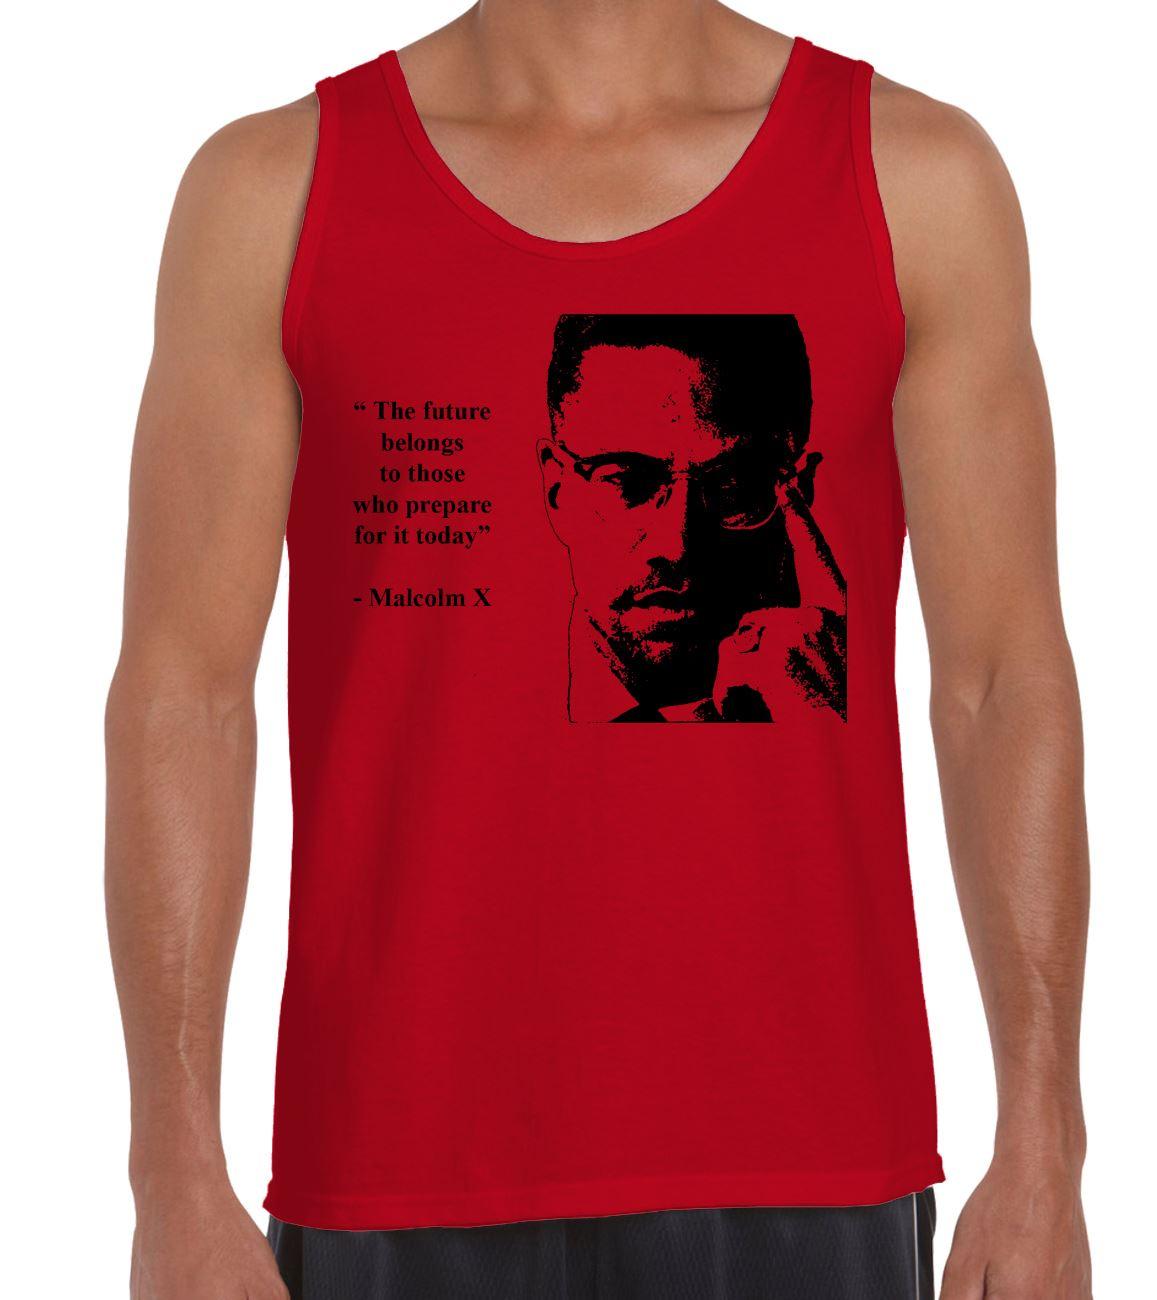 f0c90f7e Malcolm X Future Quote Men's Vest Tank Top - Civil Rights Black Panther T- Shirt